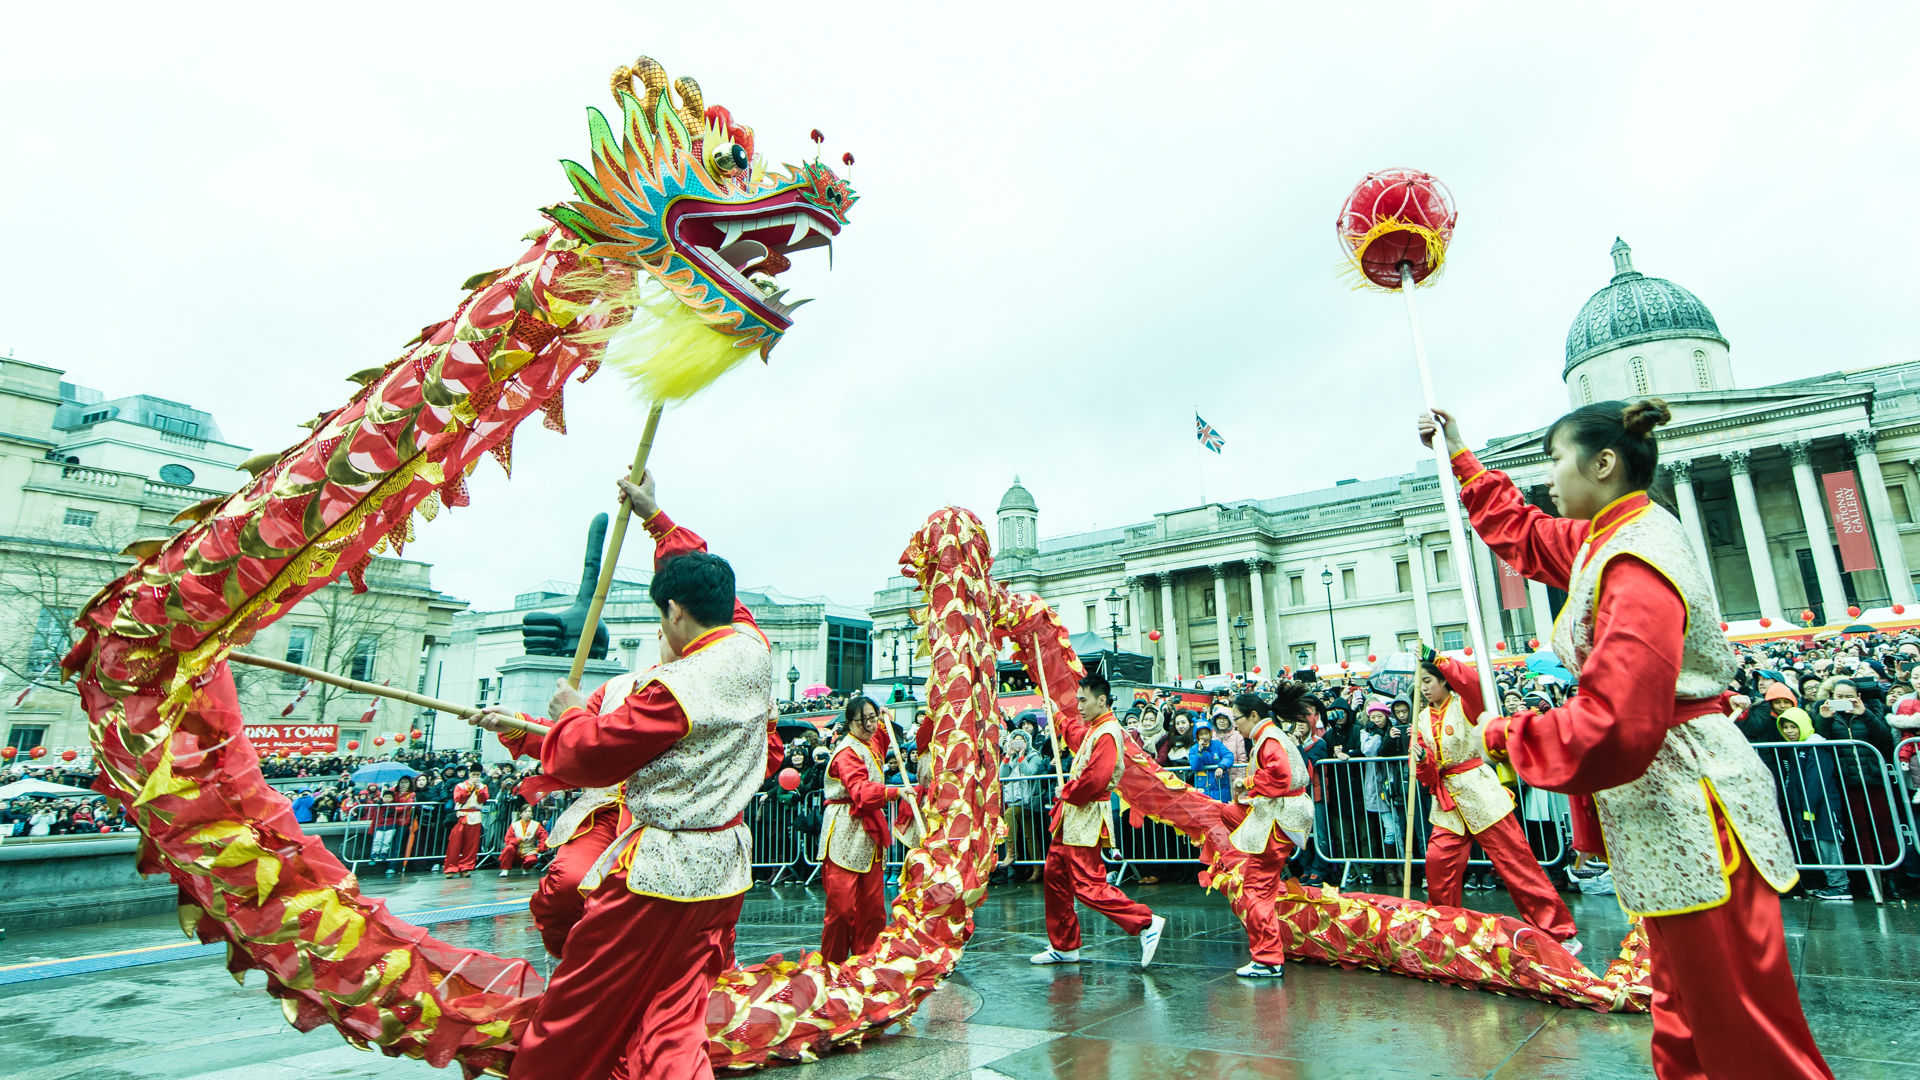 Dragon dance during Chinese New Year in Trafalgar Square. Photo: Jon Mo